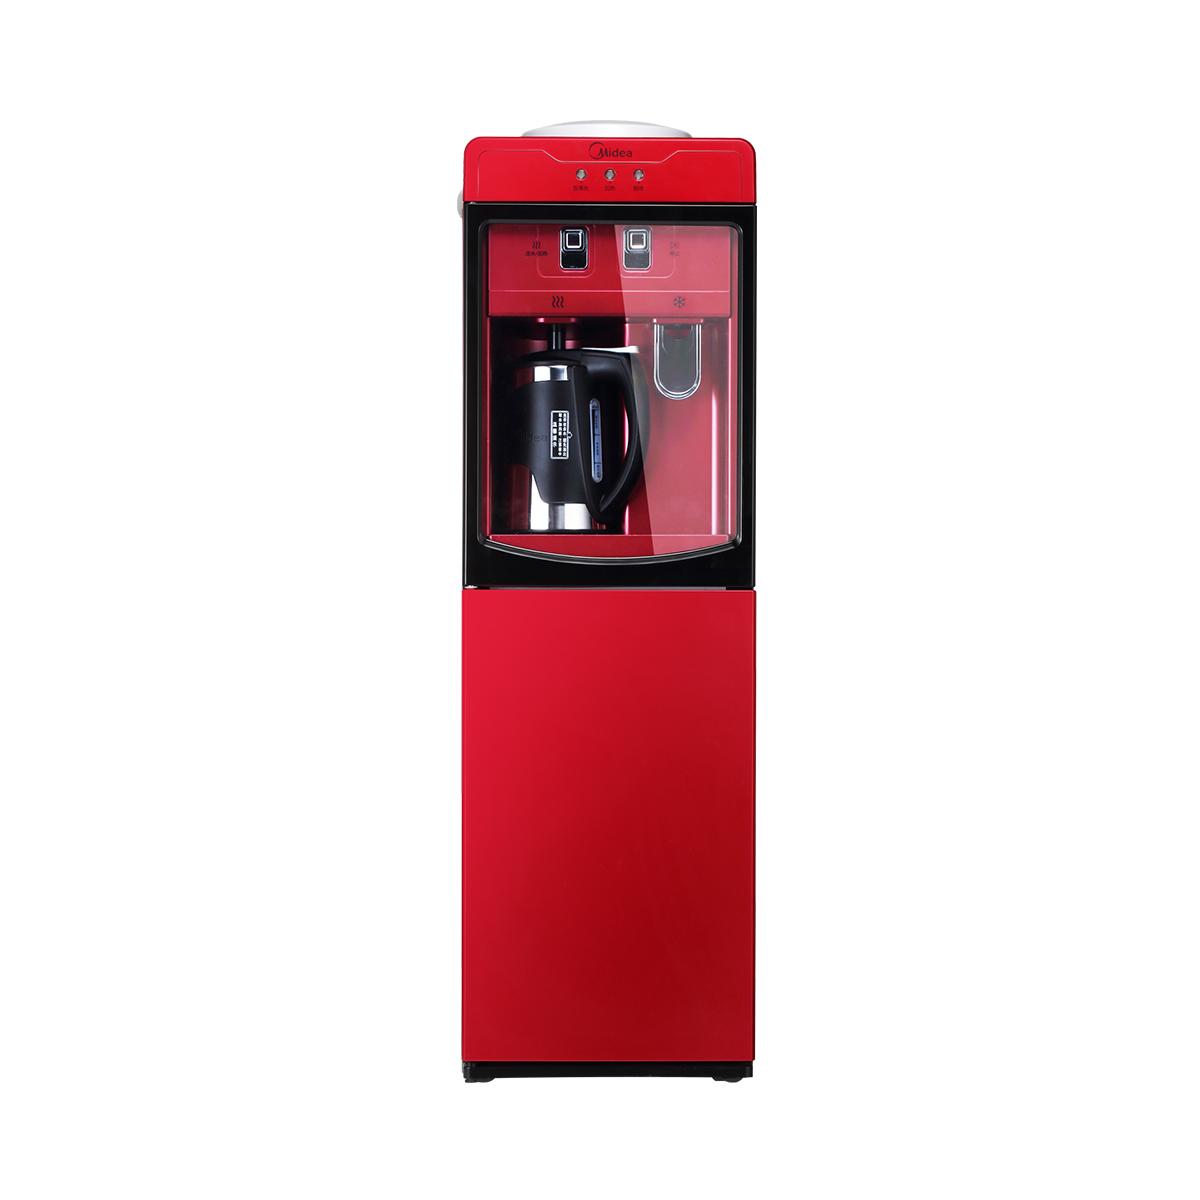 Midea/美的 YR1105S-X饮水机 说明书.pdf